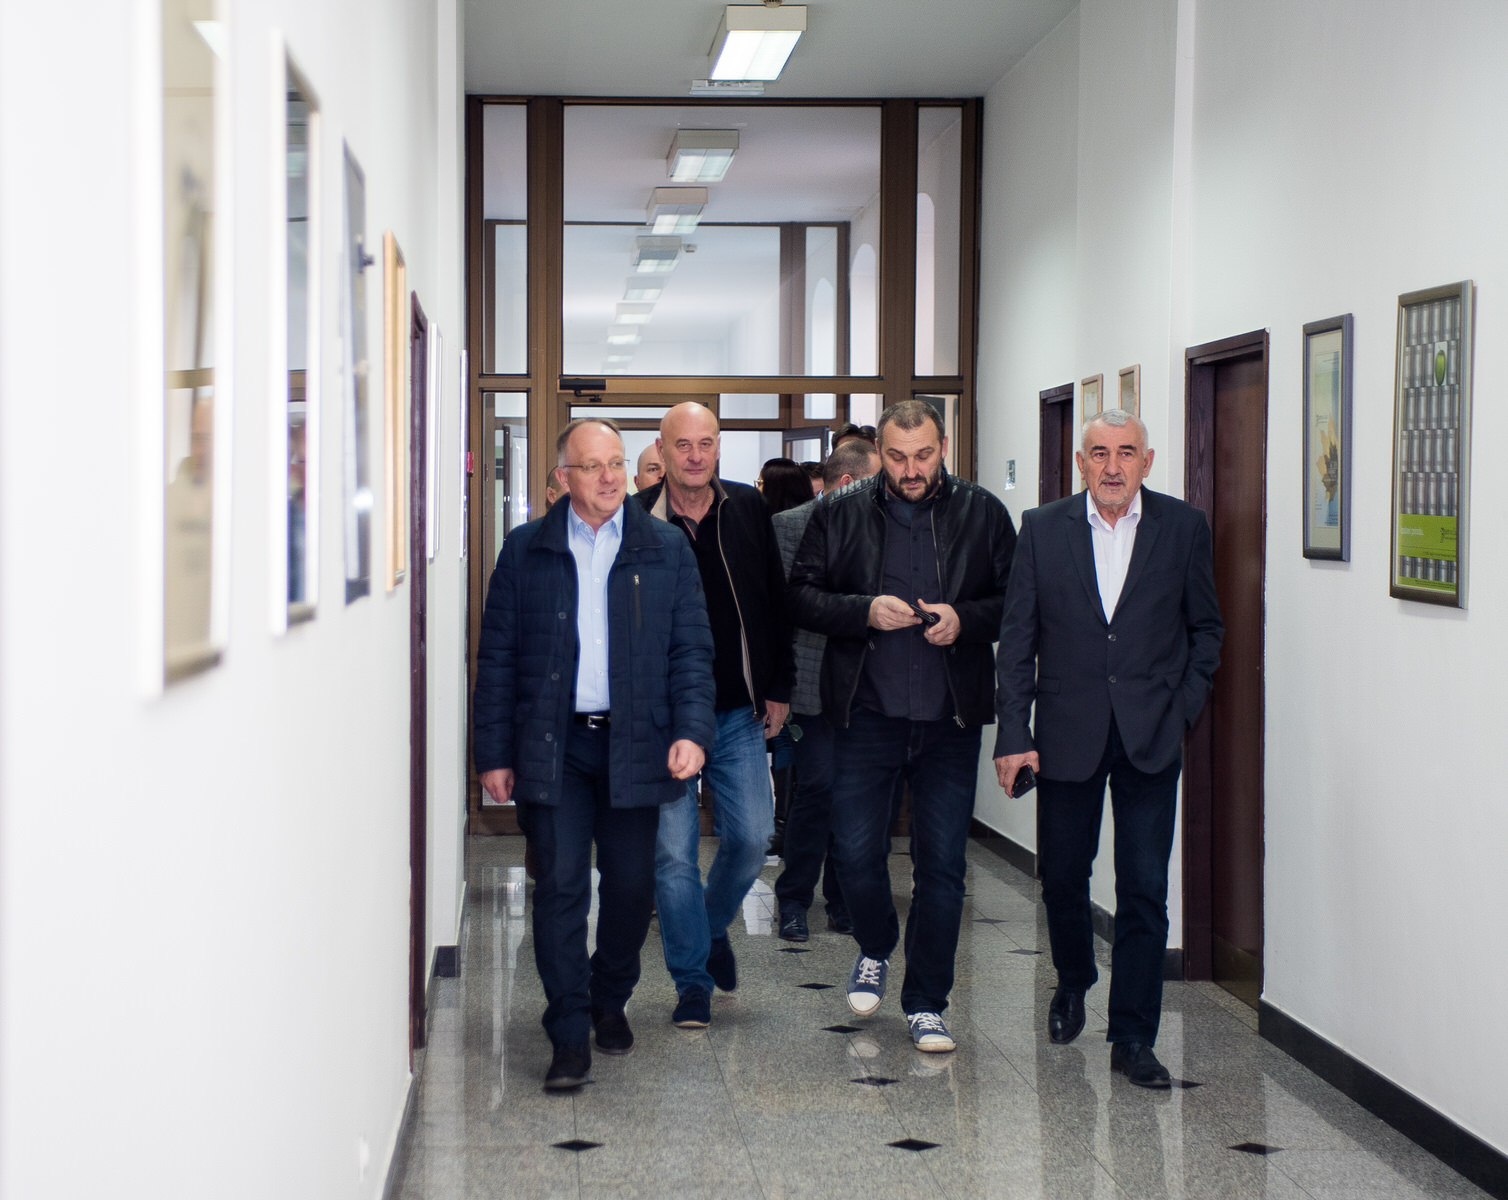 likaclub_politika-gospić_2019_bura-promjena-1